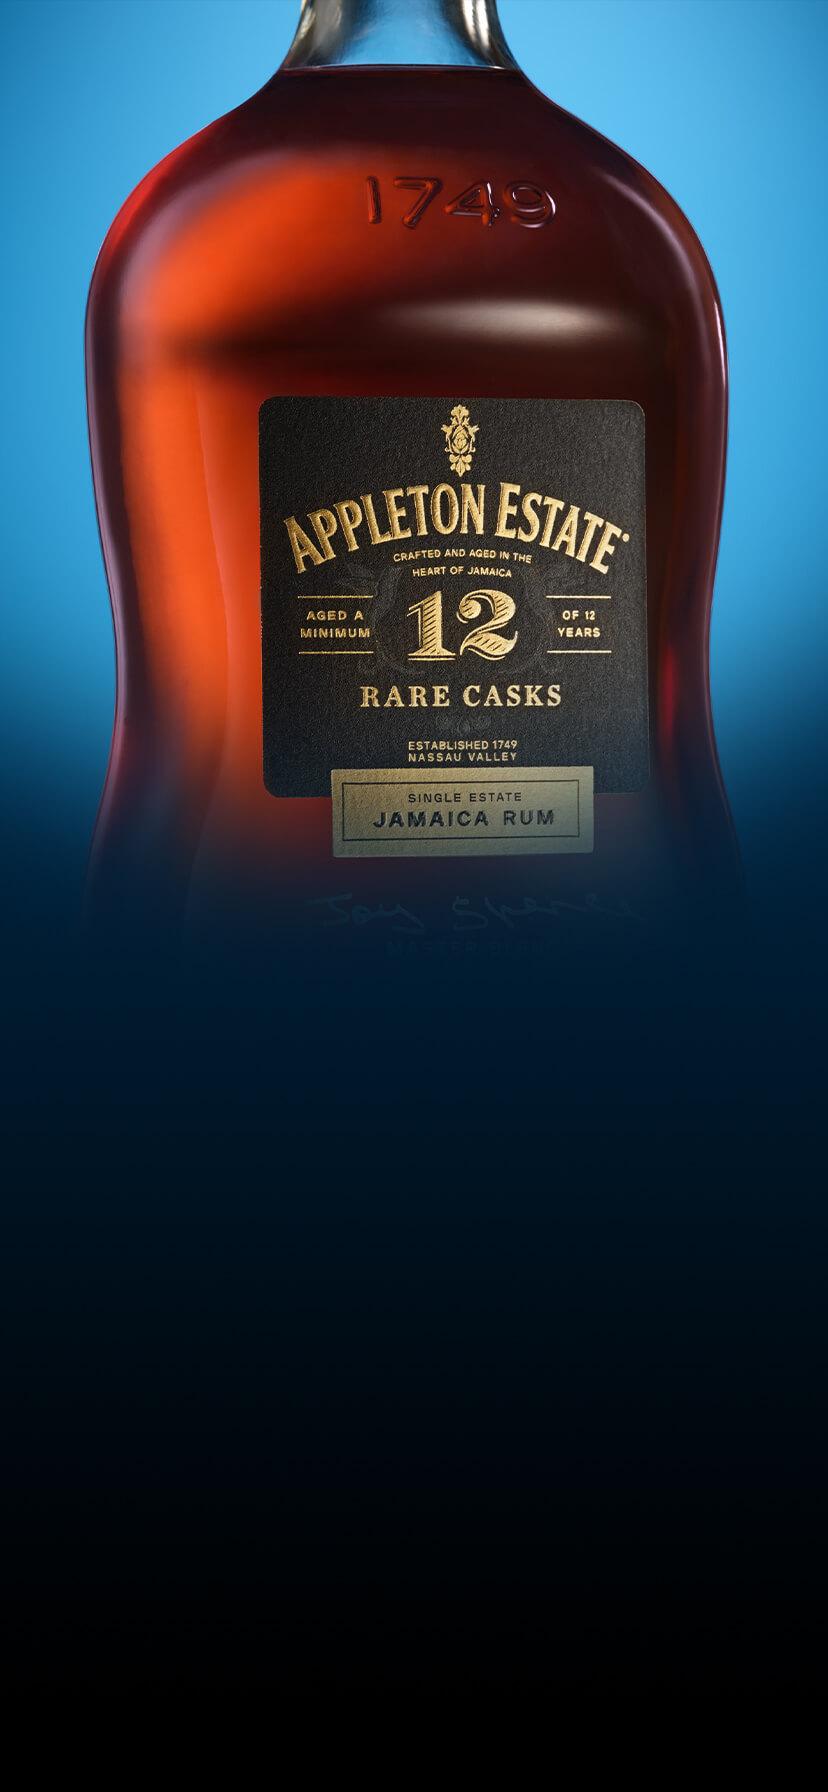 Appleton Estate 12 Year Old Rare Cask Appearance